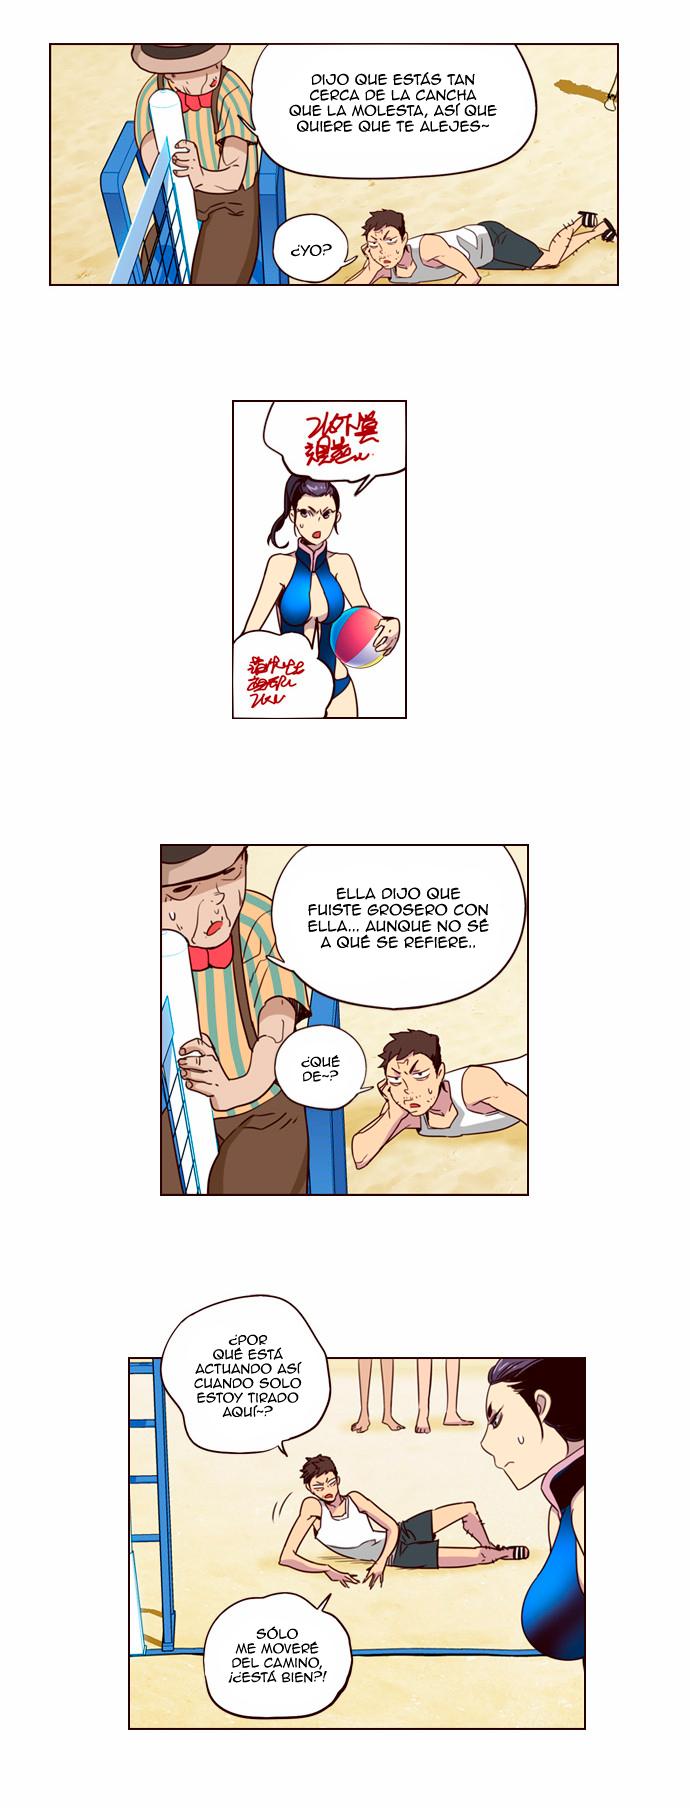 http://c5.ninemanga.com/es_manga/32/416/432519/54cb487d58110b0869e7e435175ebad8.jpg Page 5